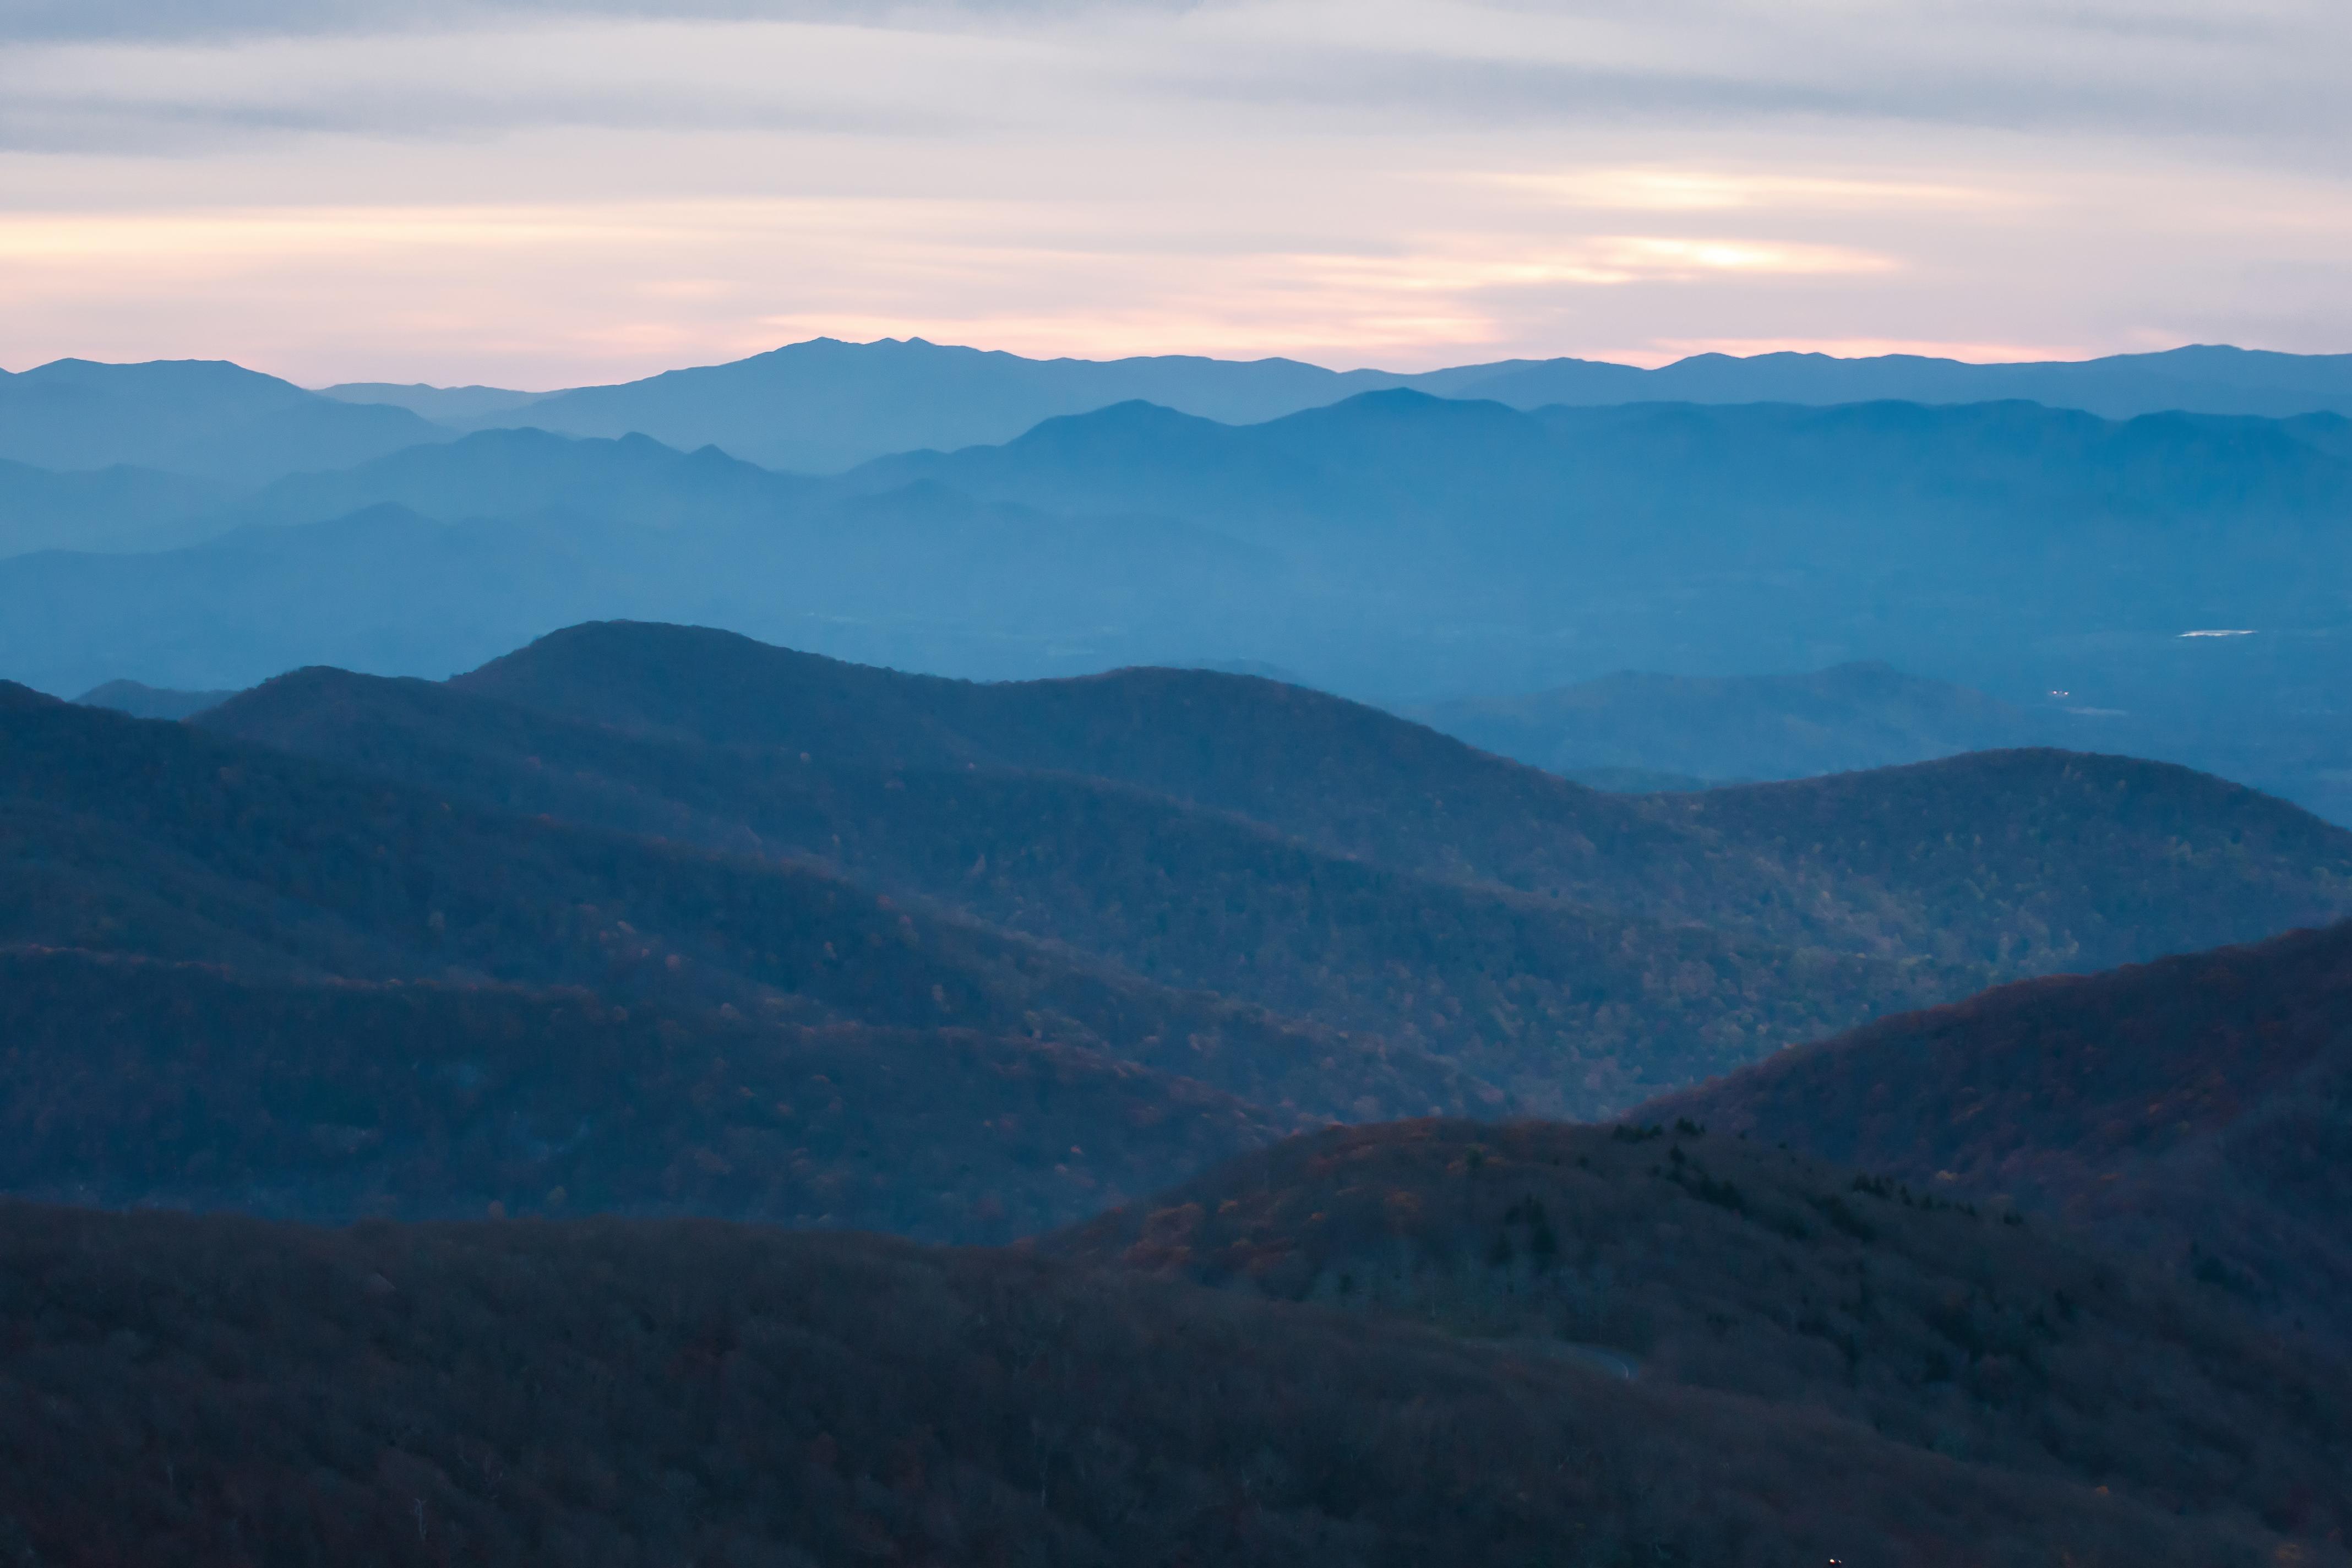 Blue ridge mountains, And, Ignorance, Nature, Mountains, HQ Photo